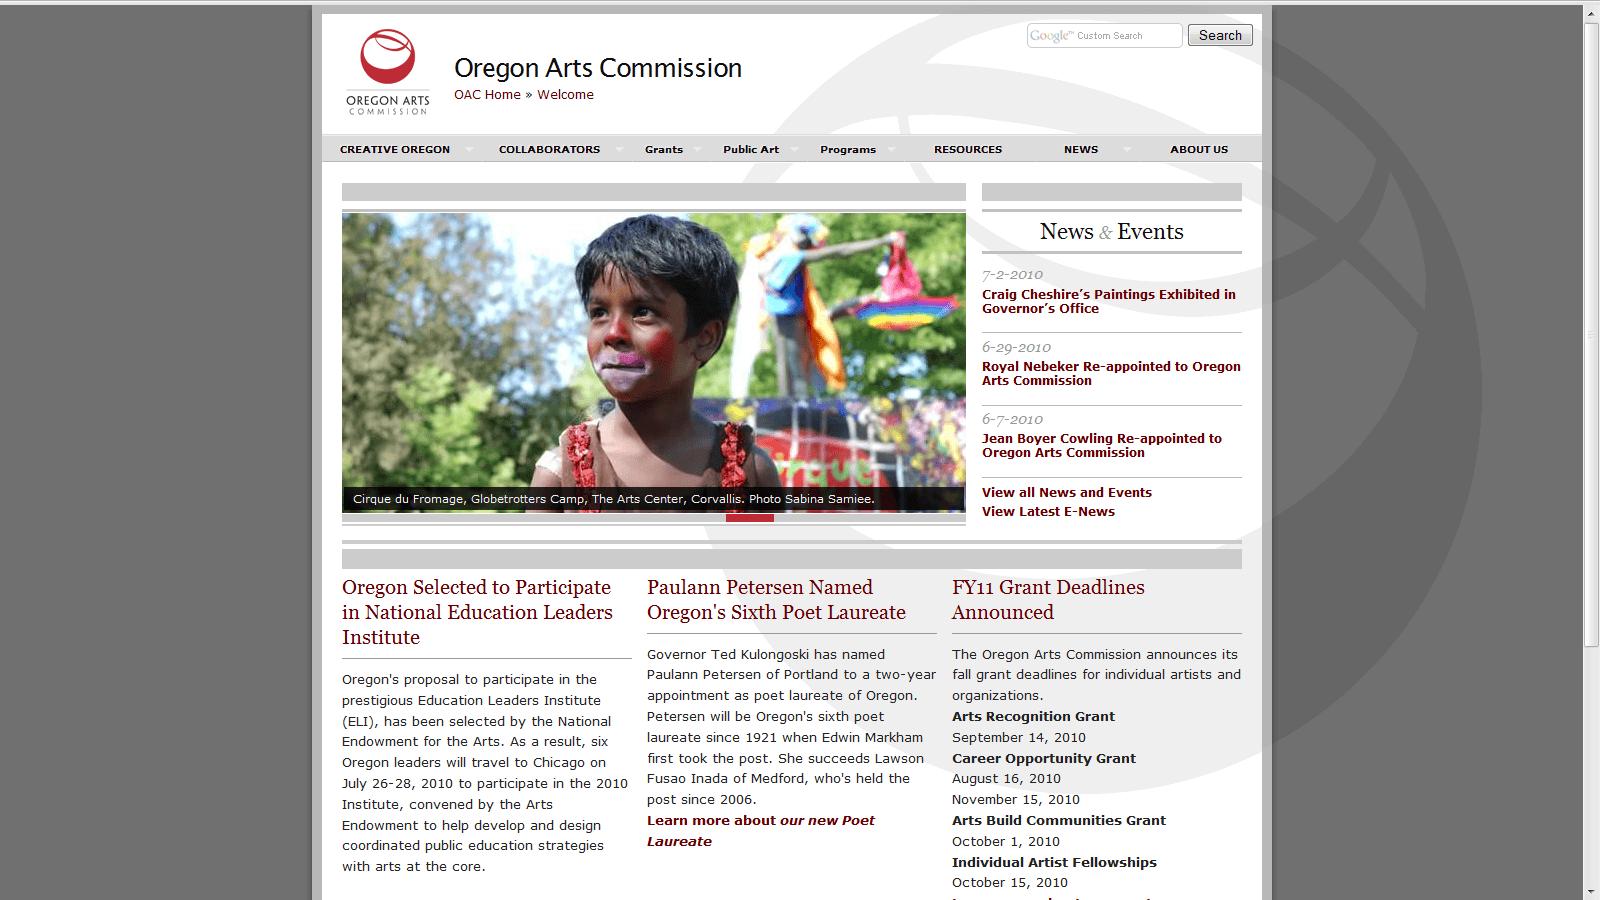 Oregon Arts Commission home page